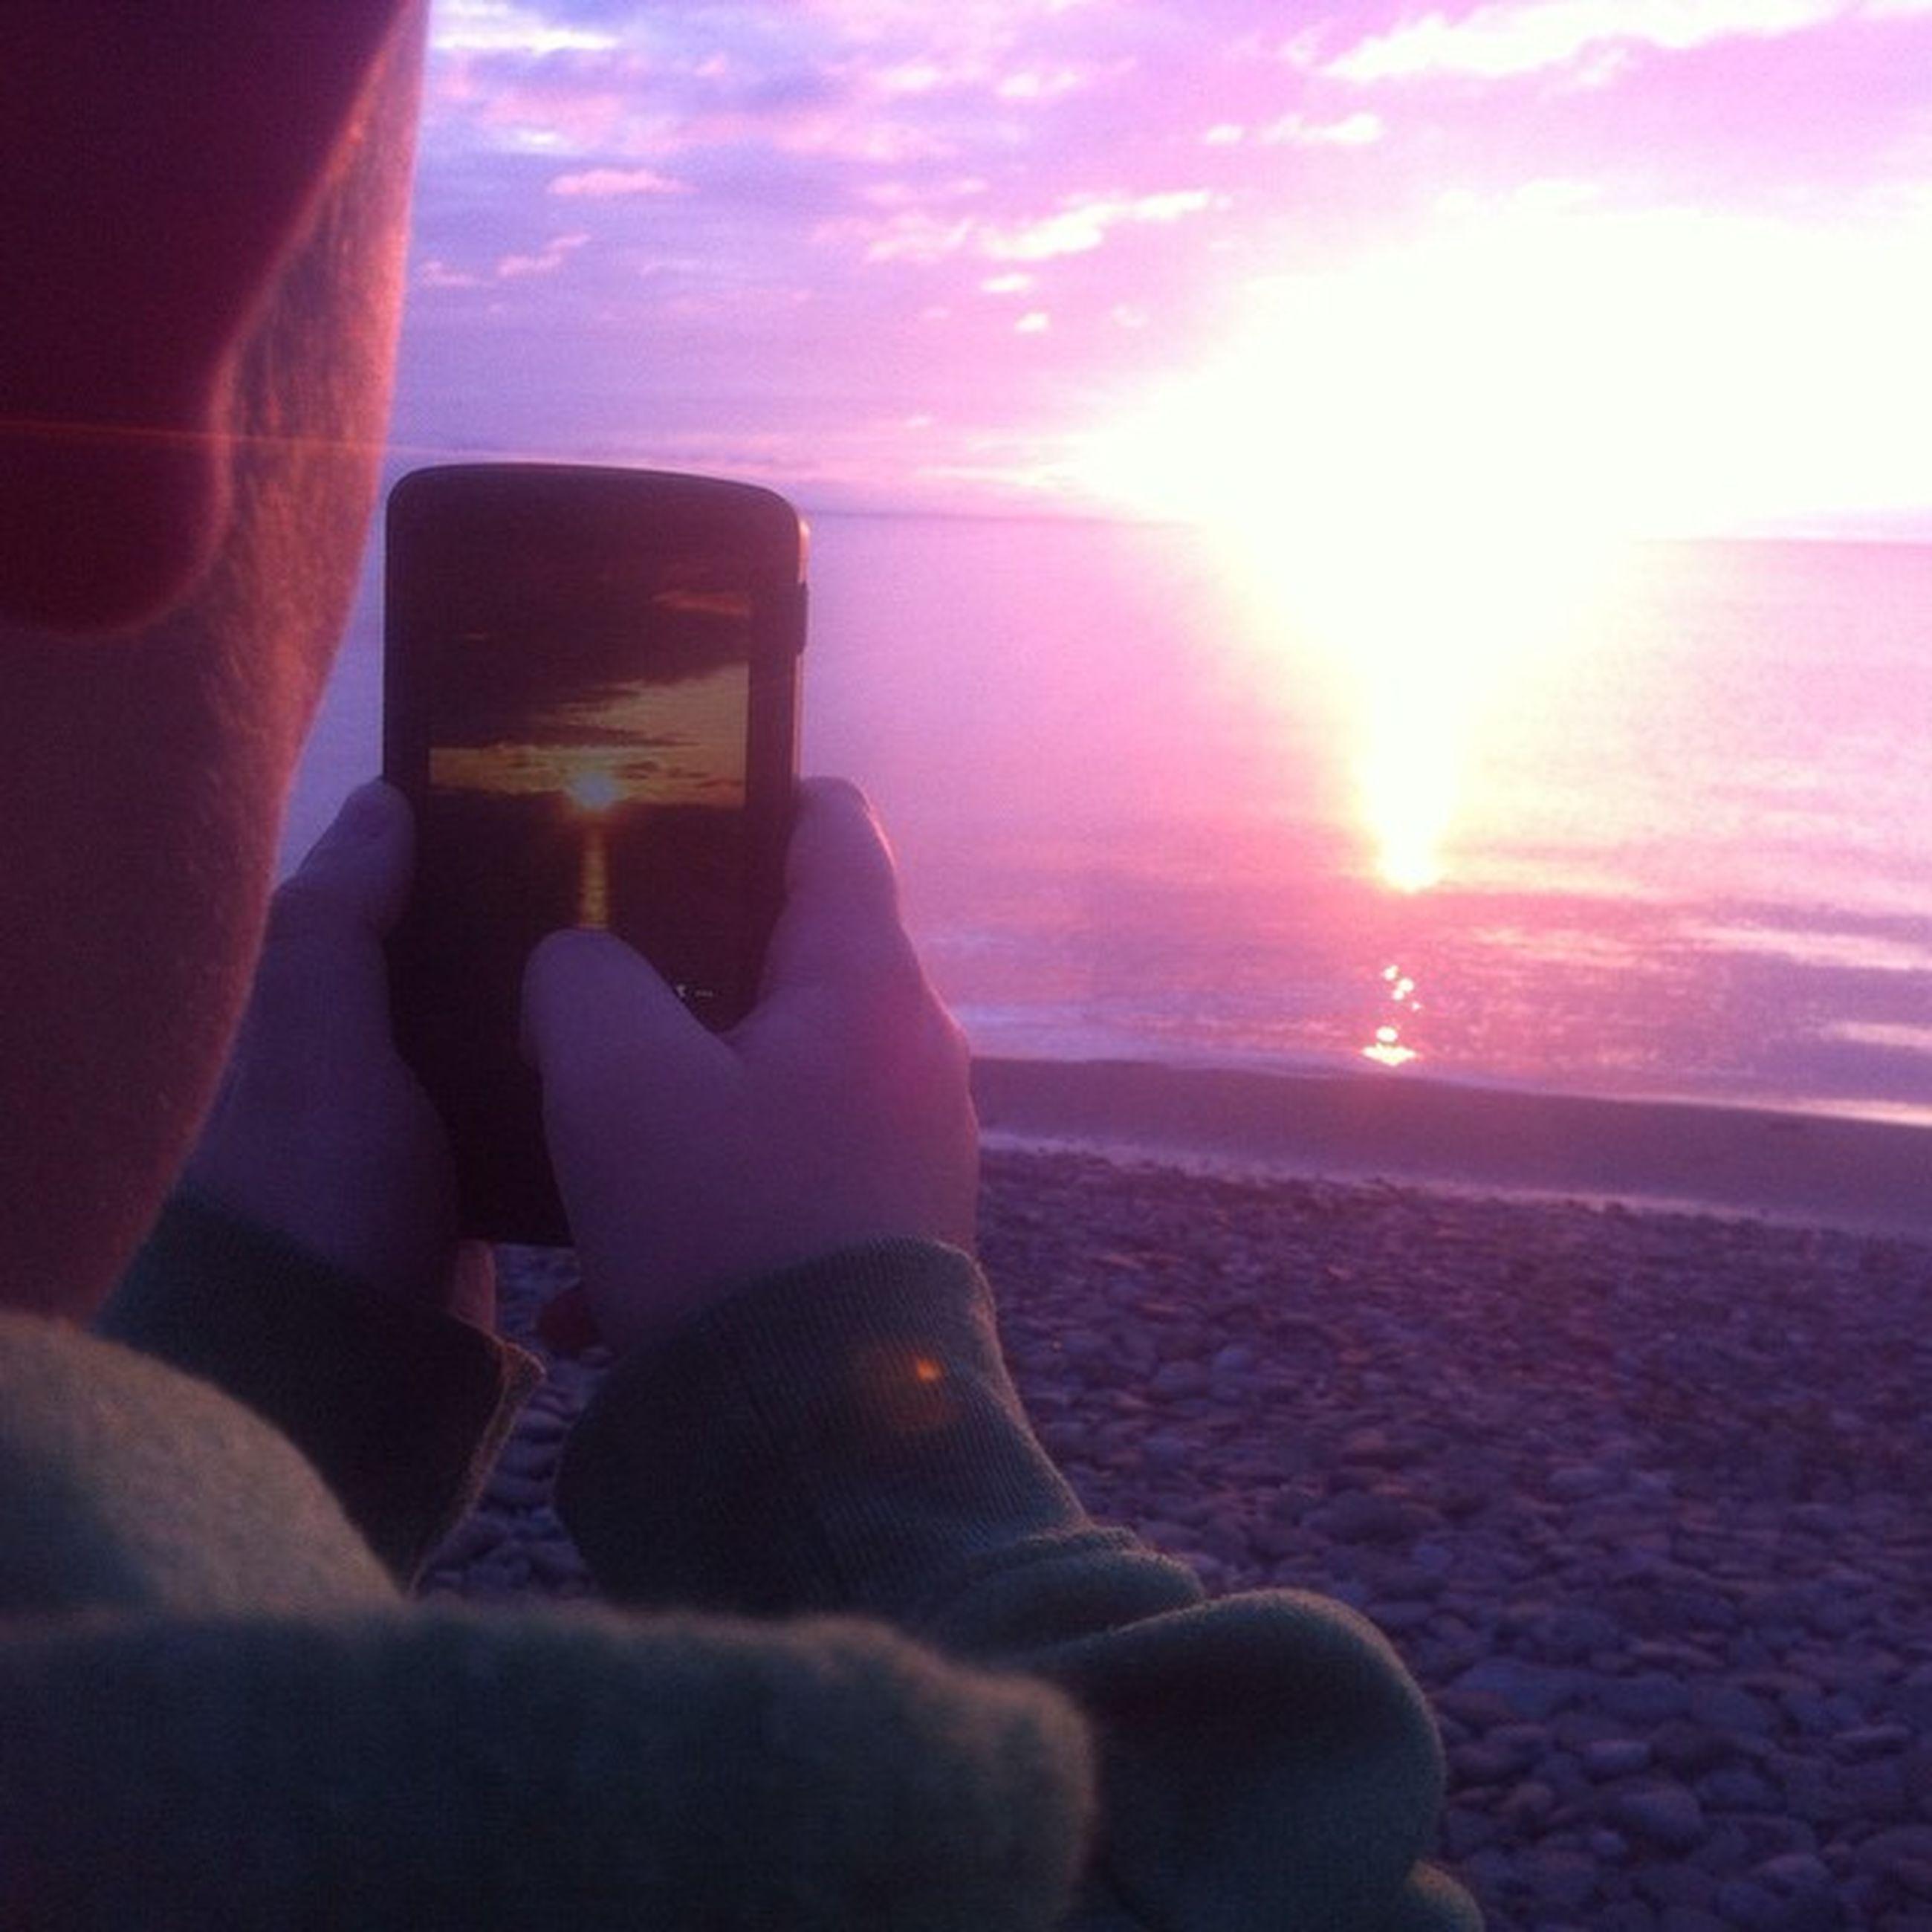 sun, lifestyles, sunset, sky, leisure activity, sunlight, sea, sunbeam, lens flare, part of, beach, horizon over water, person, cloud - sky, unrecognizable person, reflection